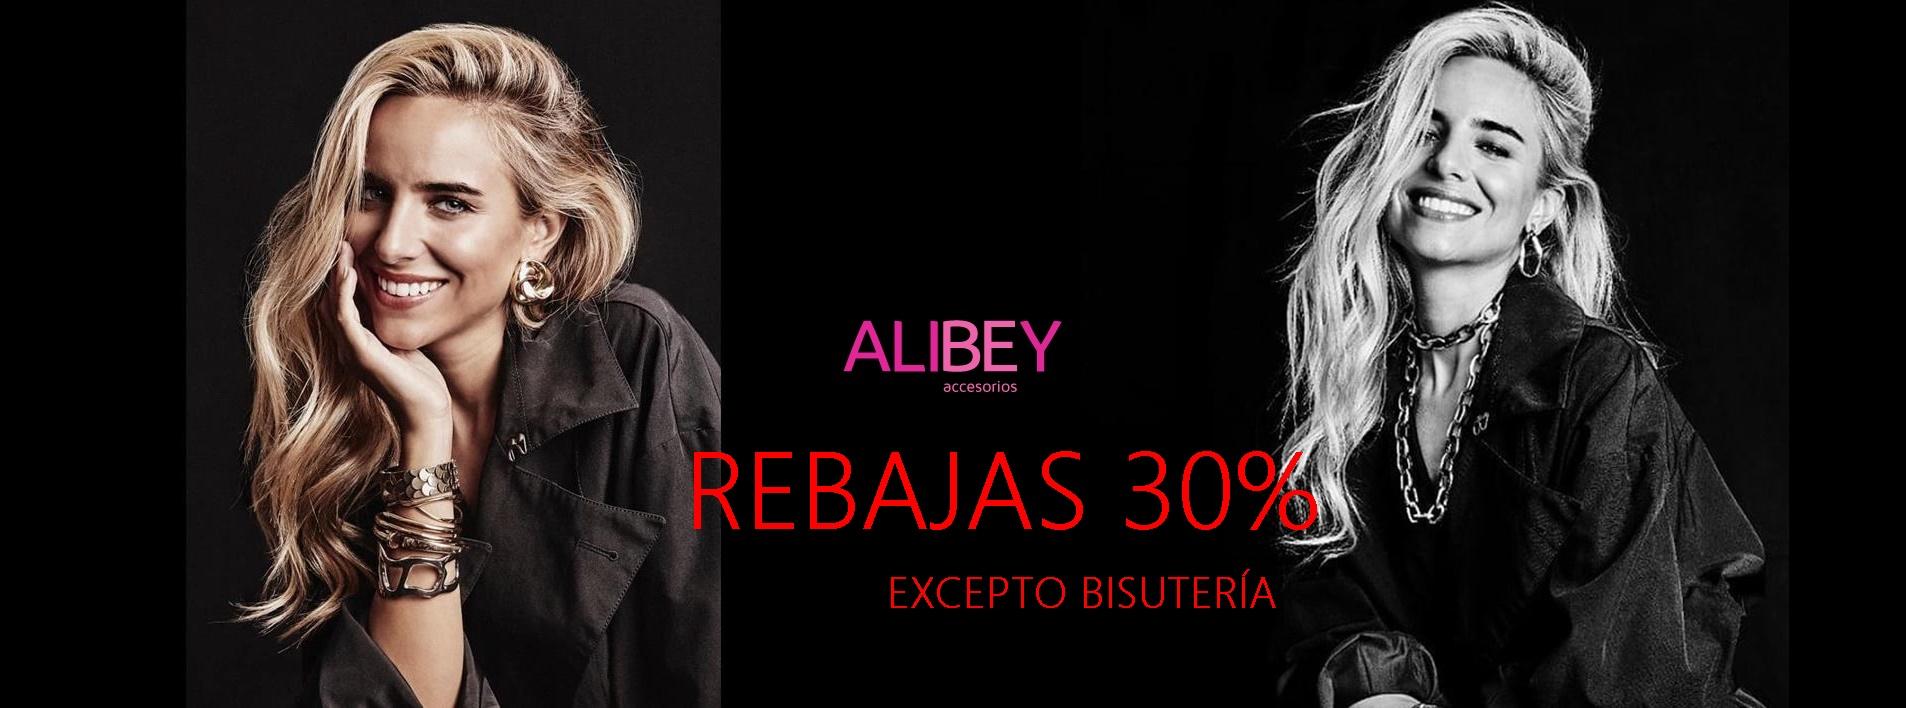 alibey-rebajas-banner